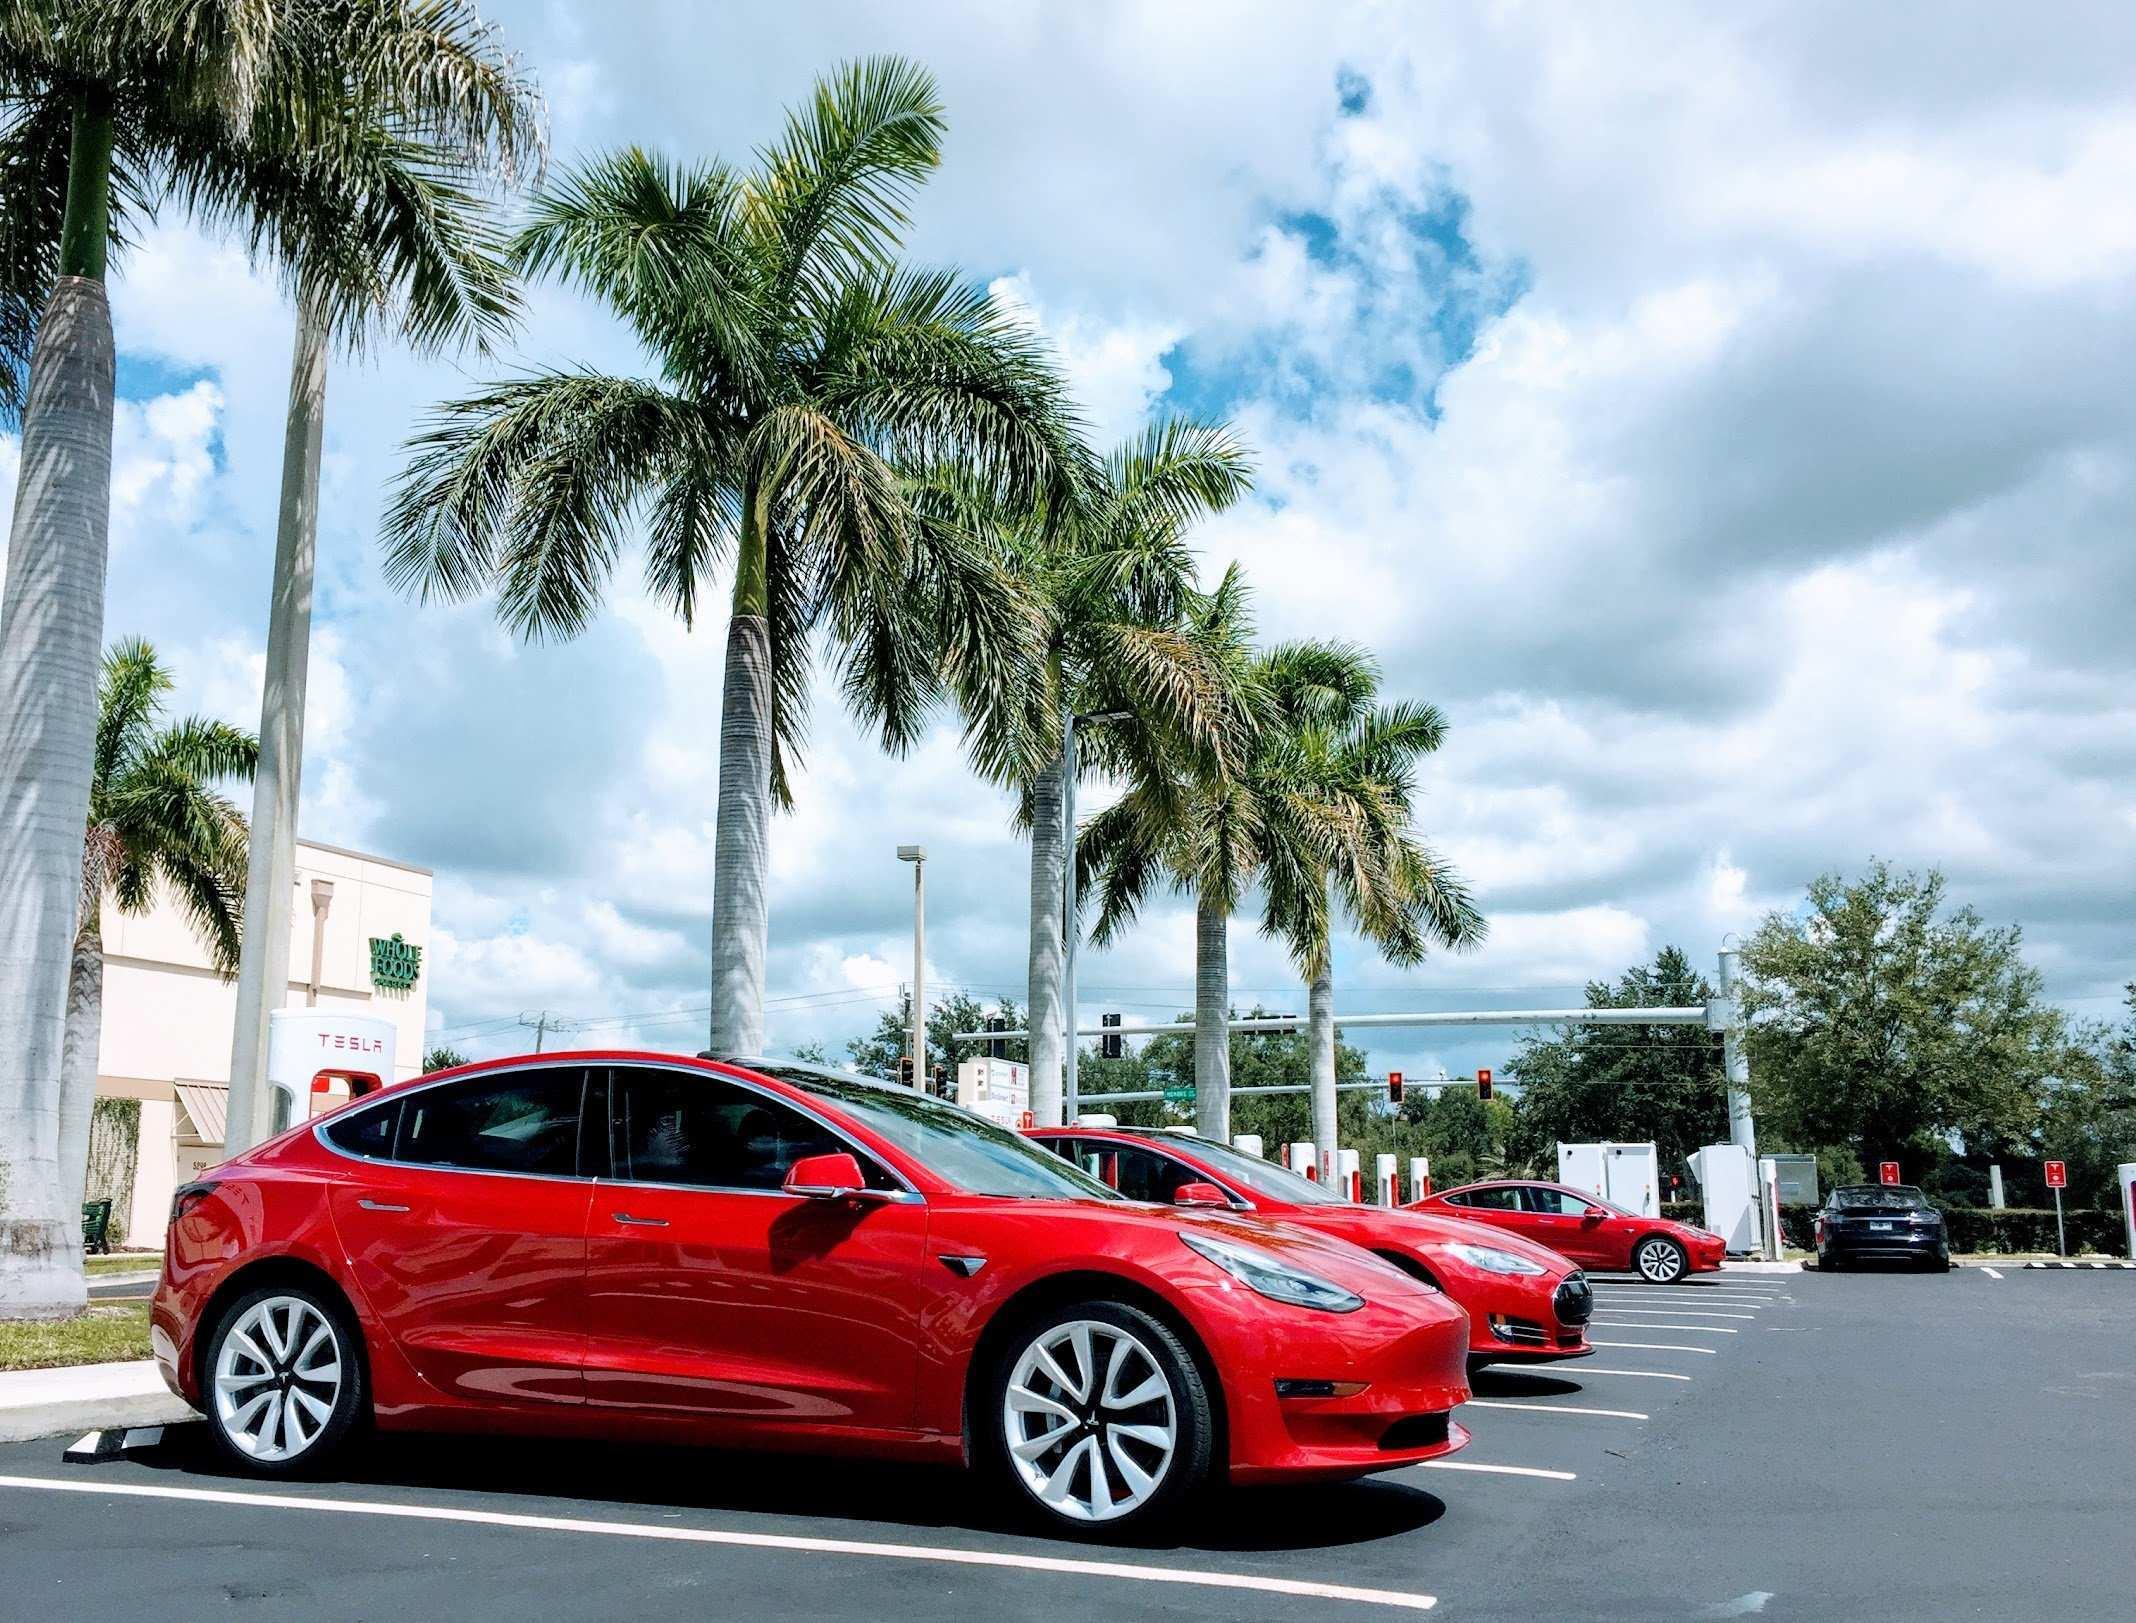 89 New Tesla Goal 2020 Wallpaper with Tesla Goal 2020